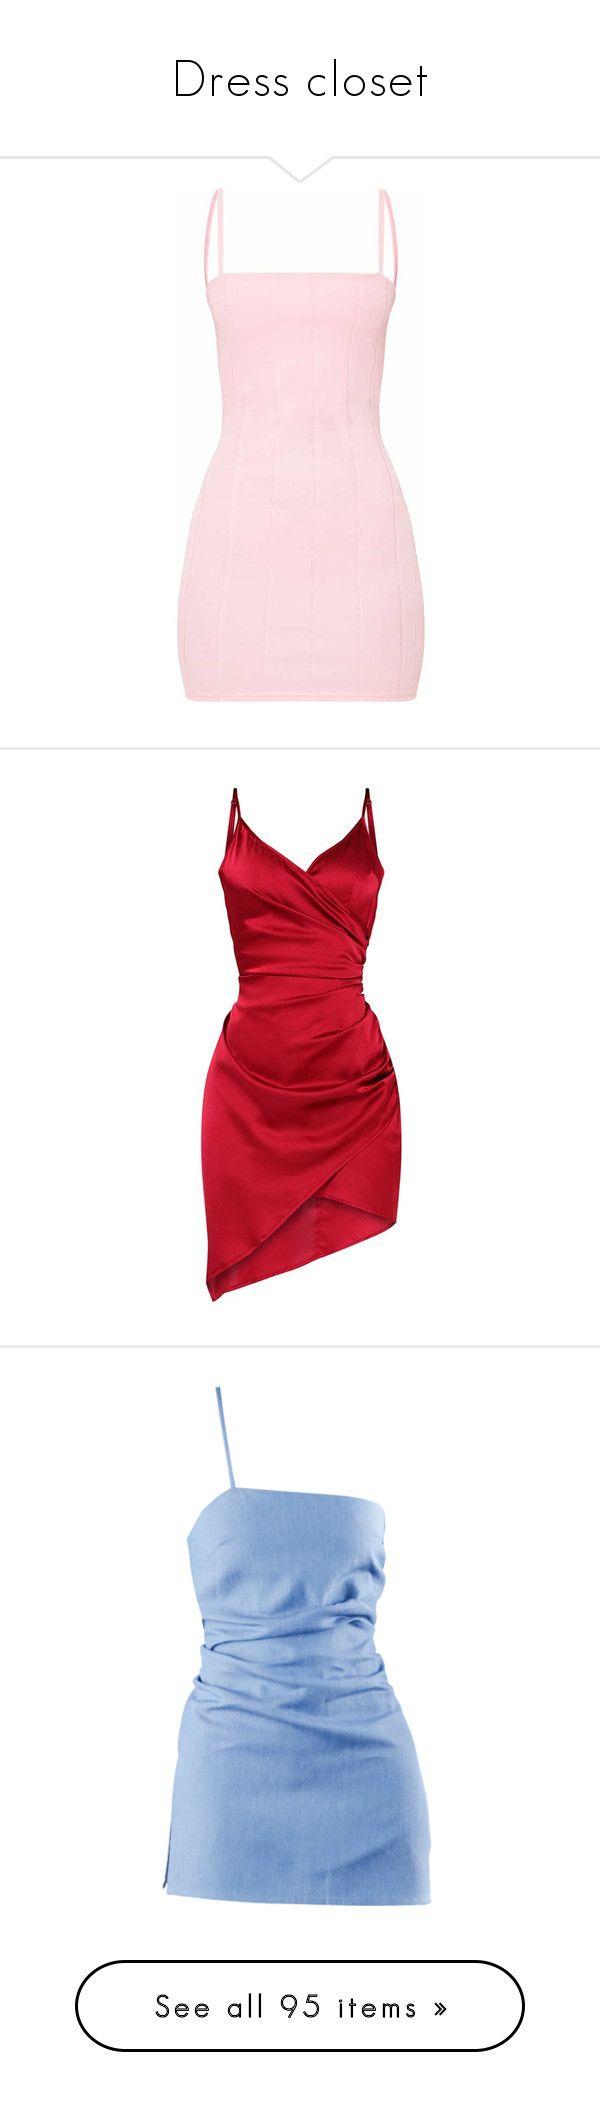 """Dress closet"" by nazarahwiggins on Polyvore featuring dresses, vestidos, bandage dresses, body con dress, straight dresses, bodycon dress, bandage bodycon dress, short dresses, satin wrap dress and red satin dress"